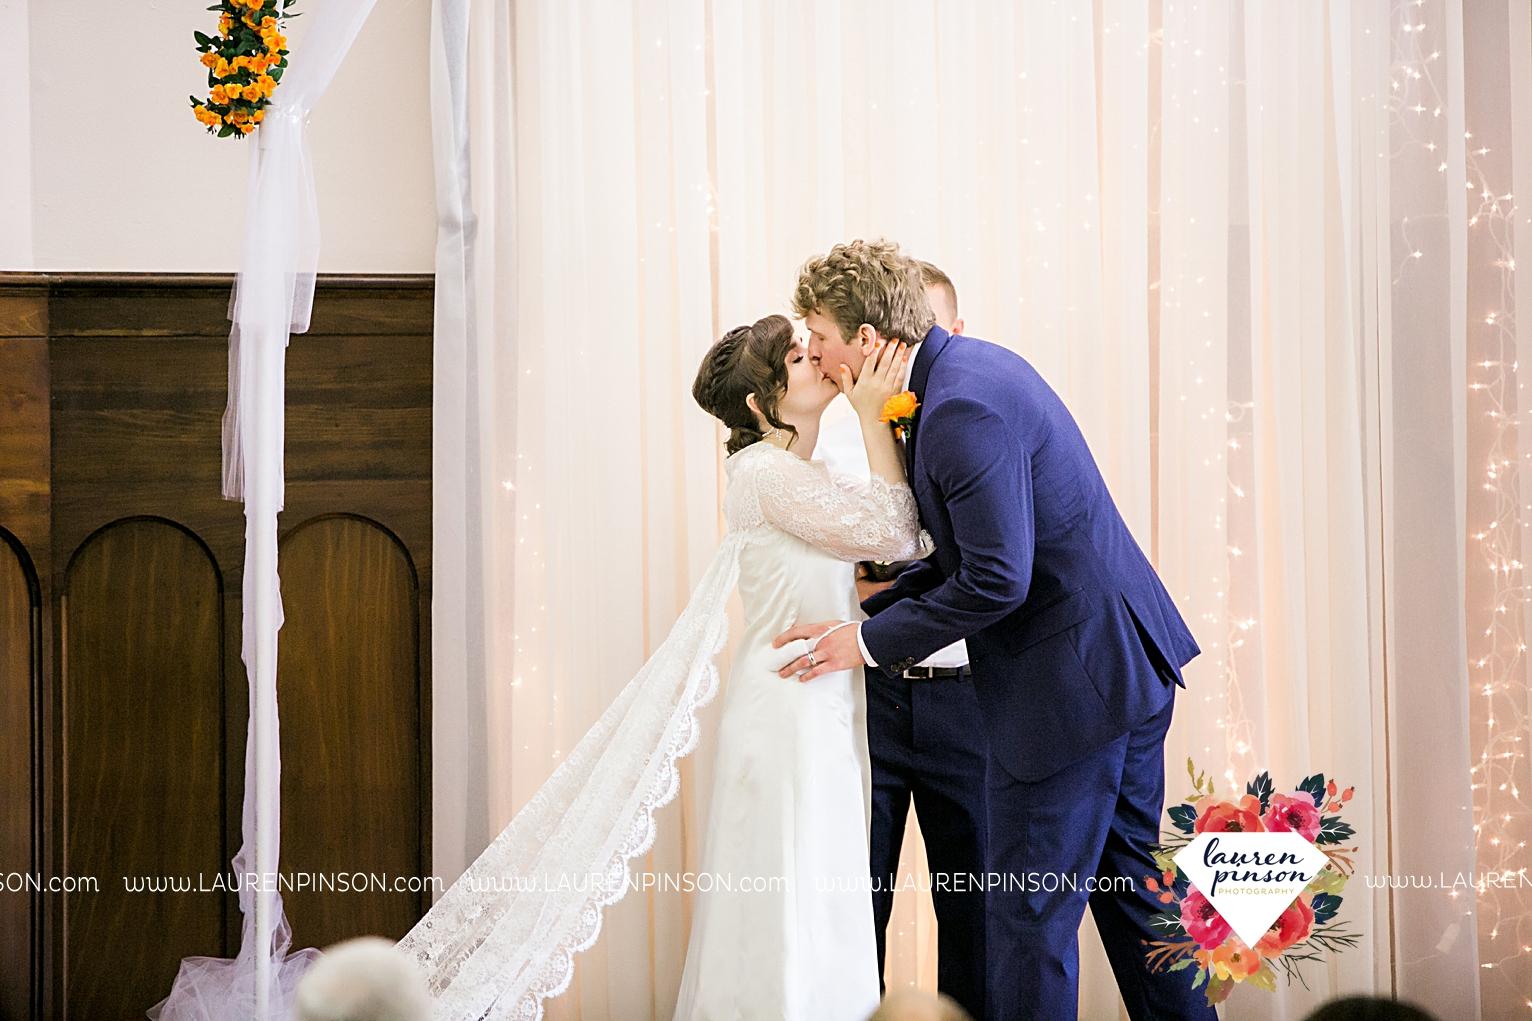 wichita-falls-texas-wedding-photographer-vintage-off-beat-bride-faith-village-church-of-christ-the-plex-roller-skating_2415.jpg